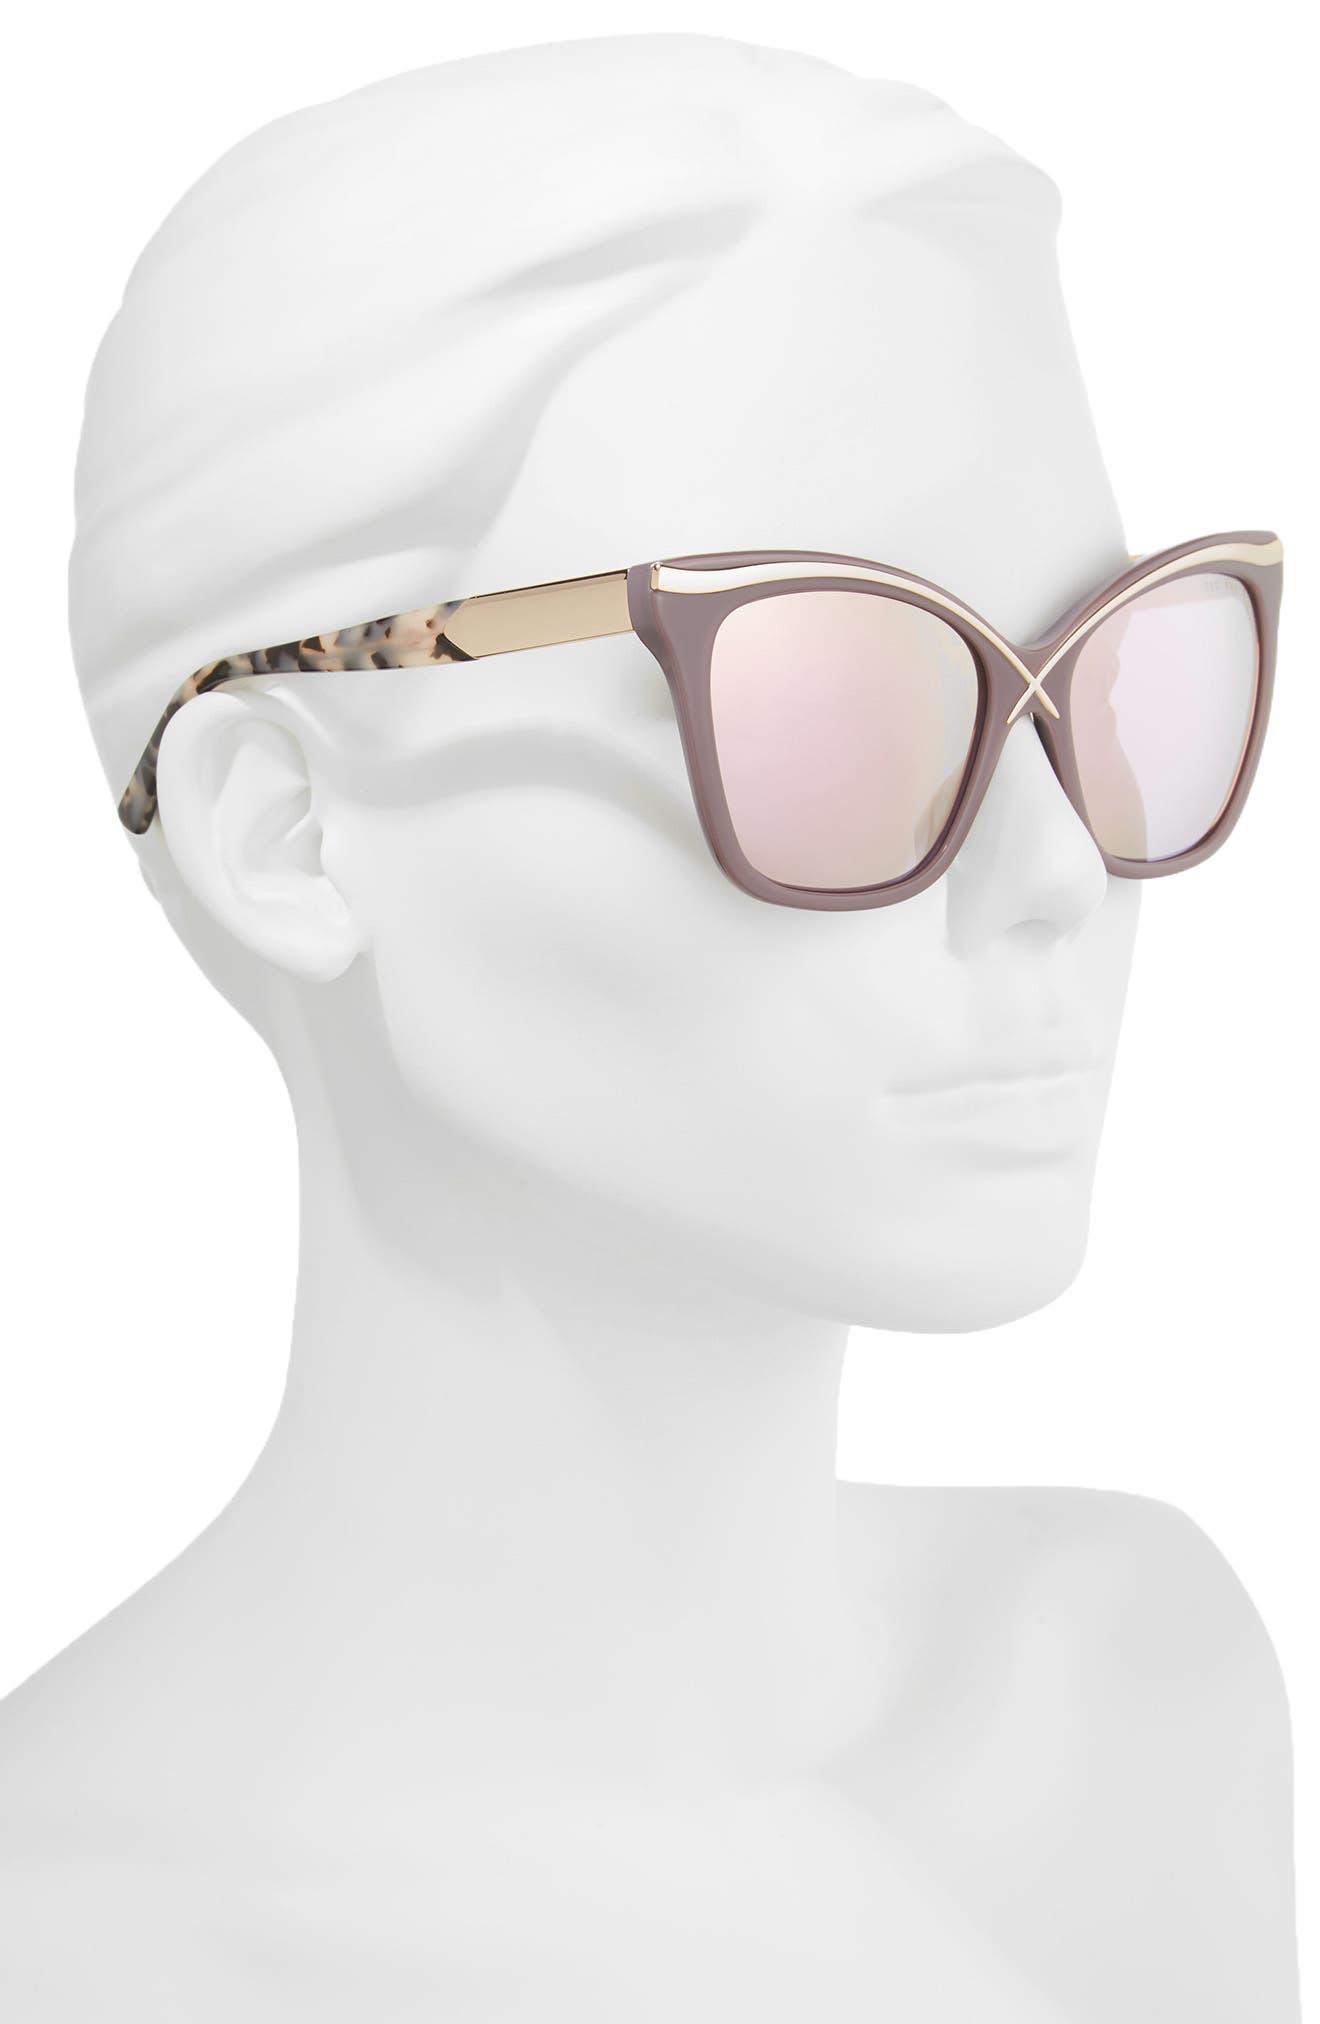 57mm Square Cat Eye Sunglasses,                             Alternate thumbnail 2, color,                             Grey